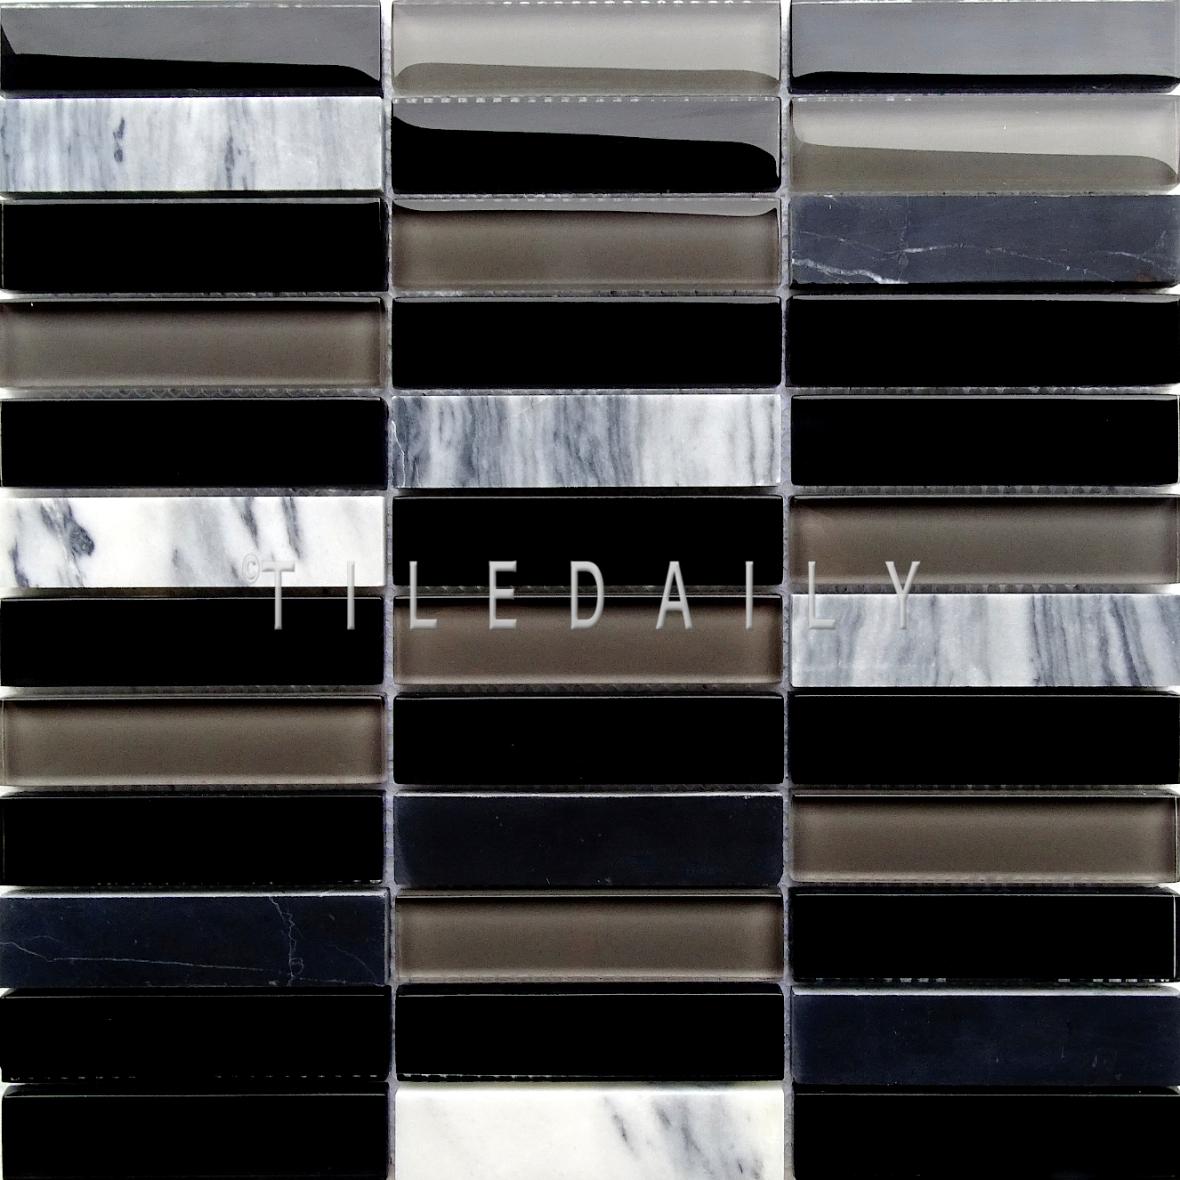 Glass and Marble Bars Mosaic, Black at TileDaily